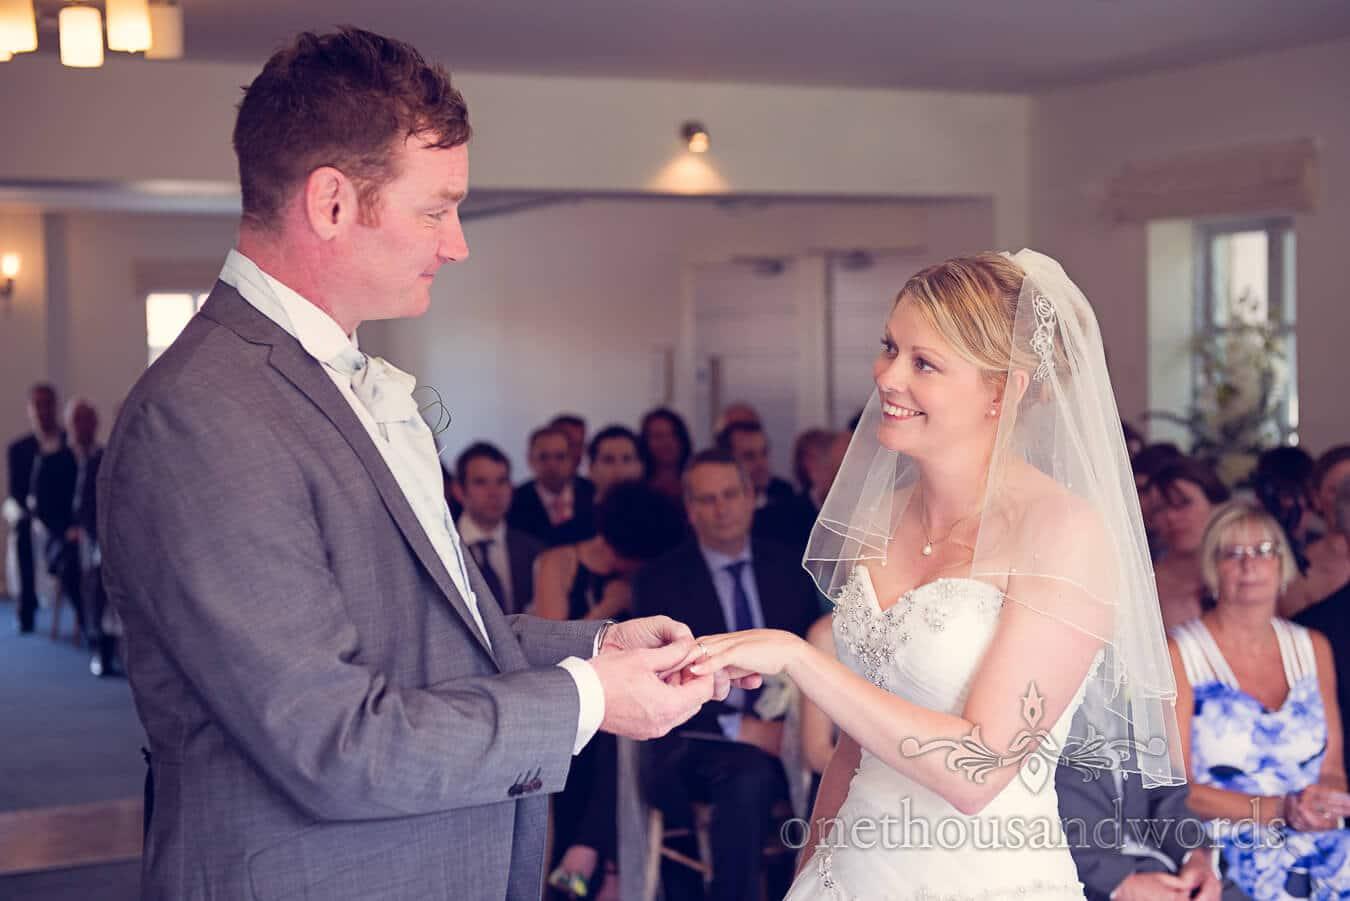 Exchange of wedding rings at Italian Villa Wedding ceremony